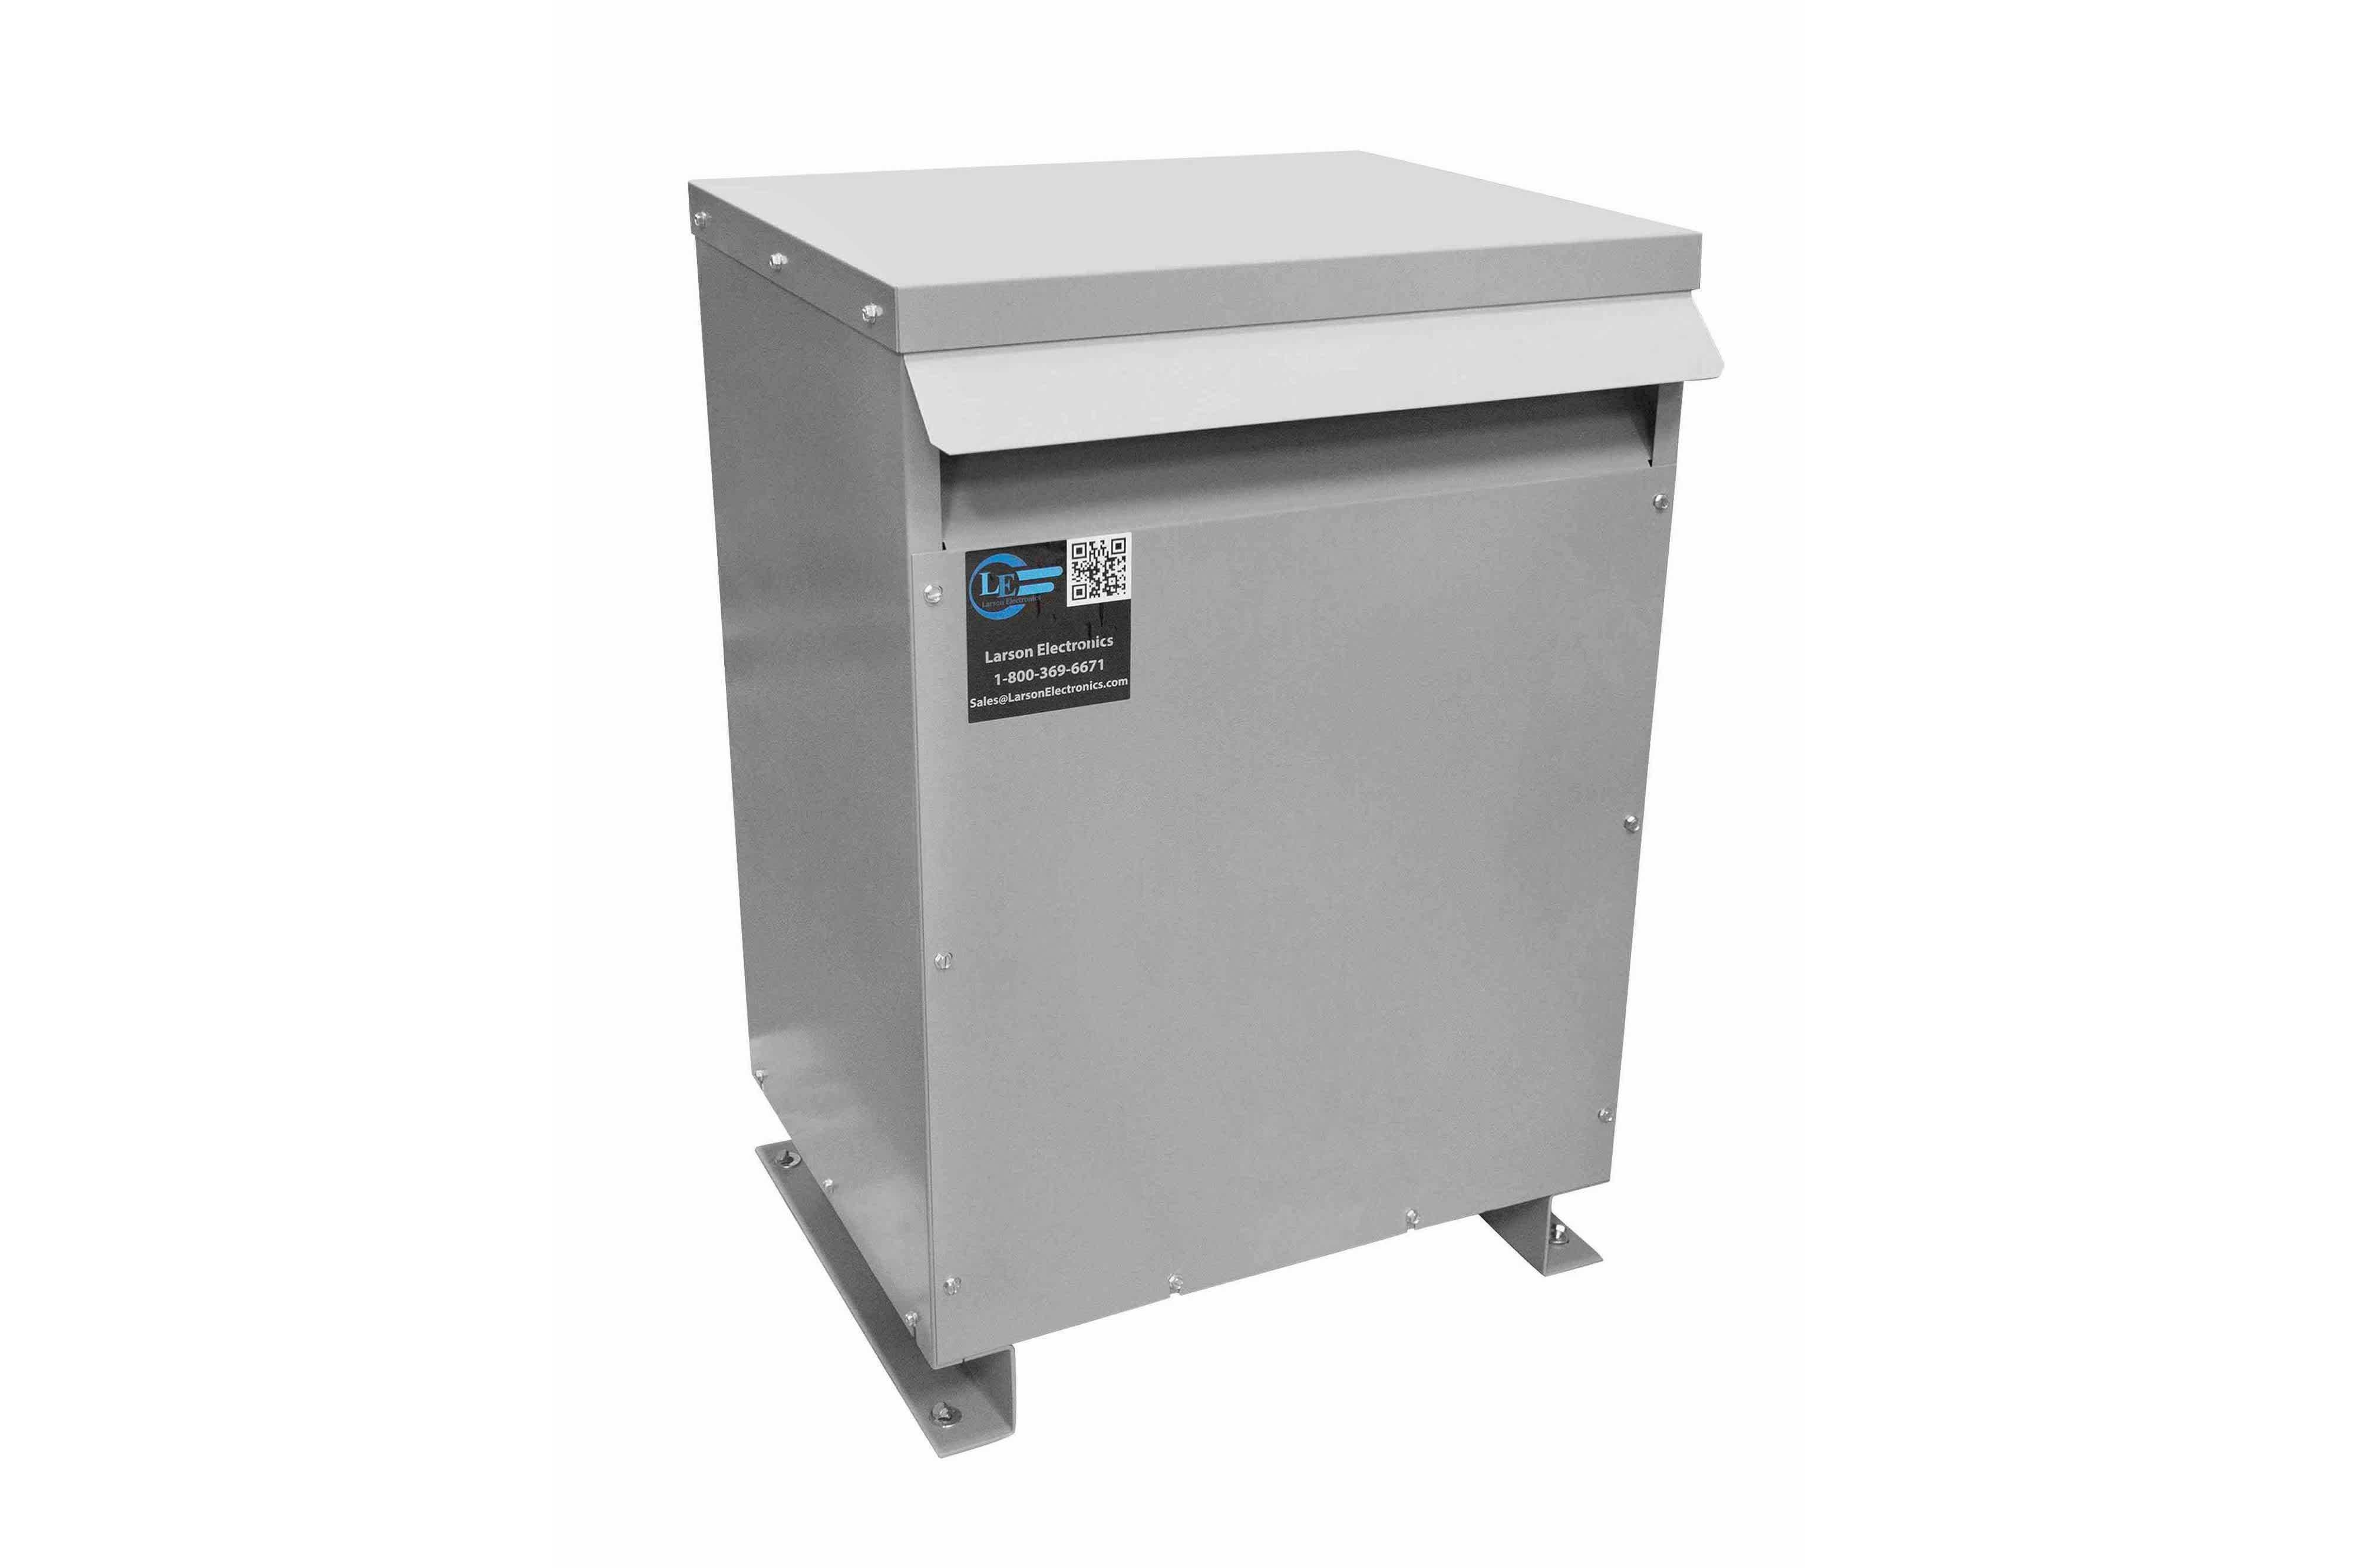 26 kVA 3PH Isolation Transformer, 240V Wye Primary, 380V Delta Secondary, N3R, Ventilated, 60 Hz